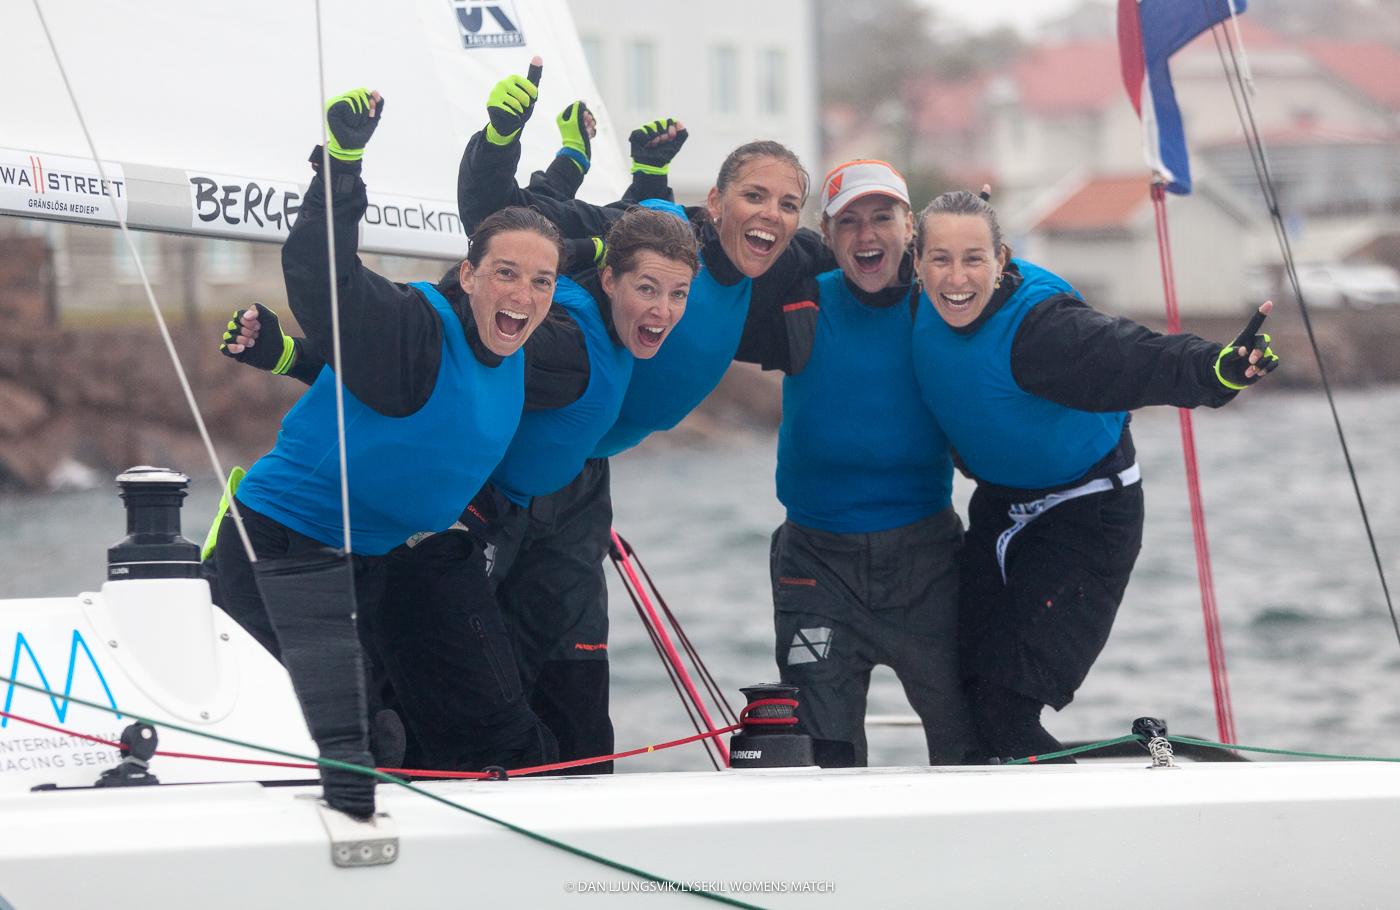 Lysekil Womens Match 2017, Lysekil, Sweden. Photo: Dan Ljungsvik/LWM